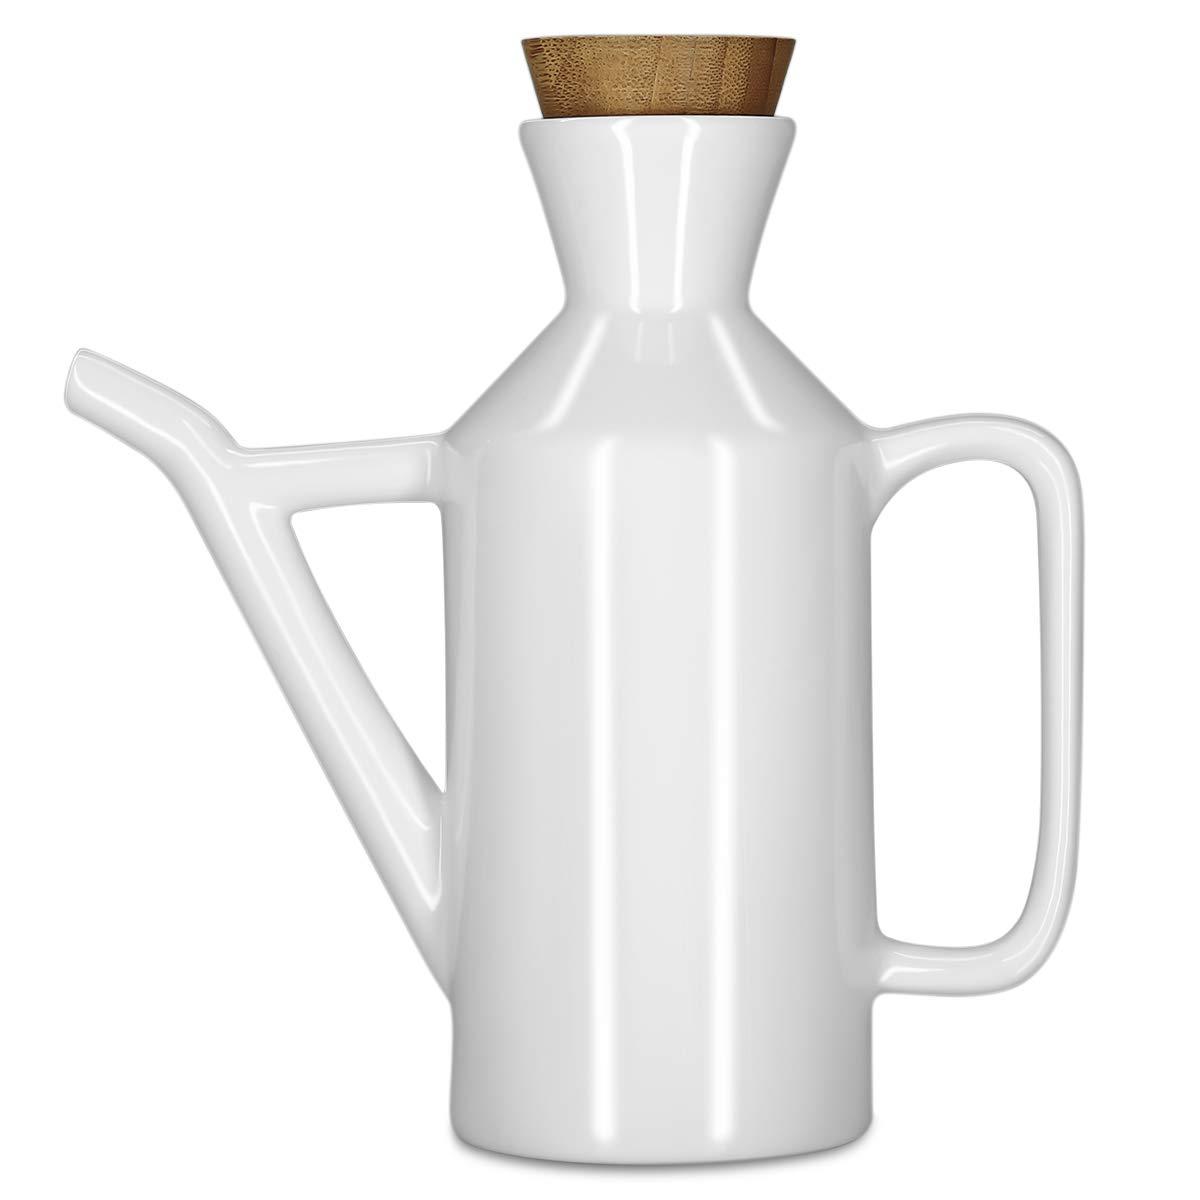 Vinkoe Kitchen Olive Oil Dispenser Bottle, Soy Sauce or Vinegar Cruet with Pourer, 15.2 OZ Modern White Ceramic Tabletop Liquid Condiment Dispenser by Vinkoe Kitchen (Image #1)